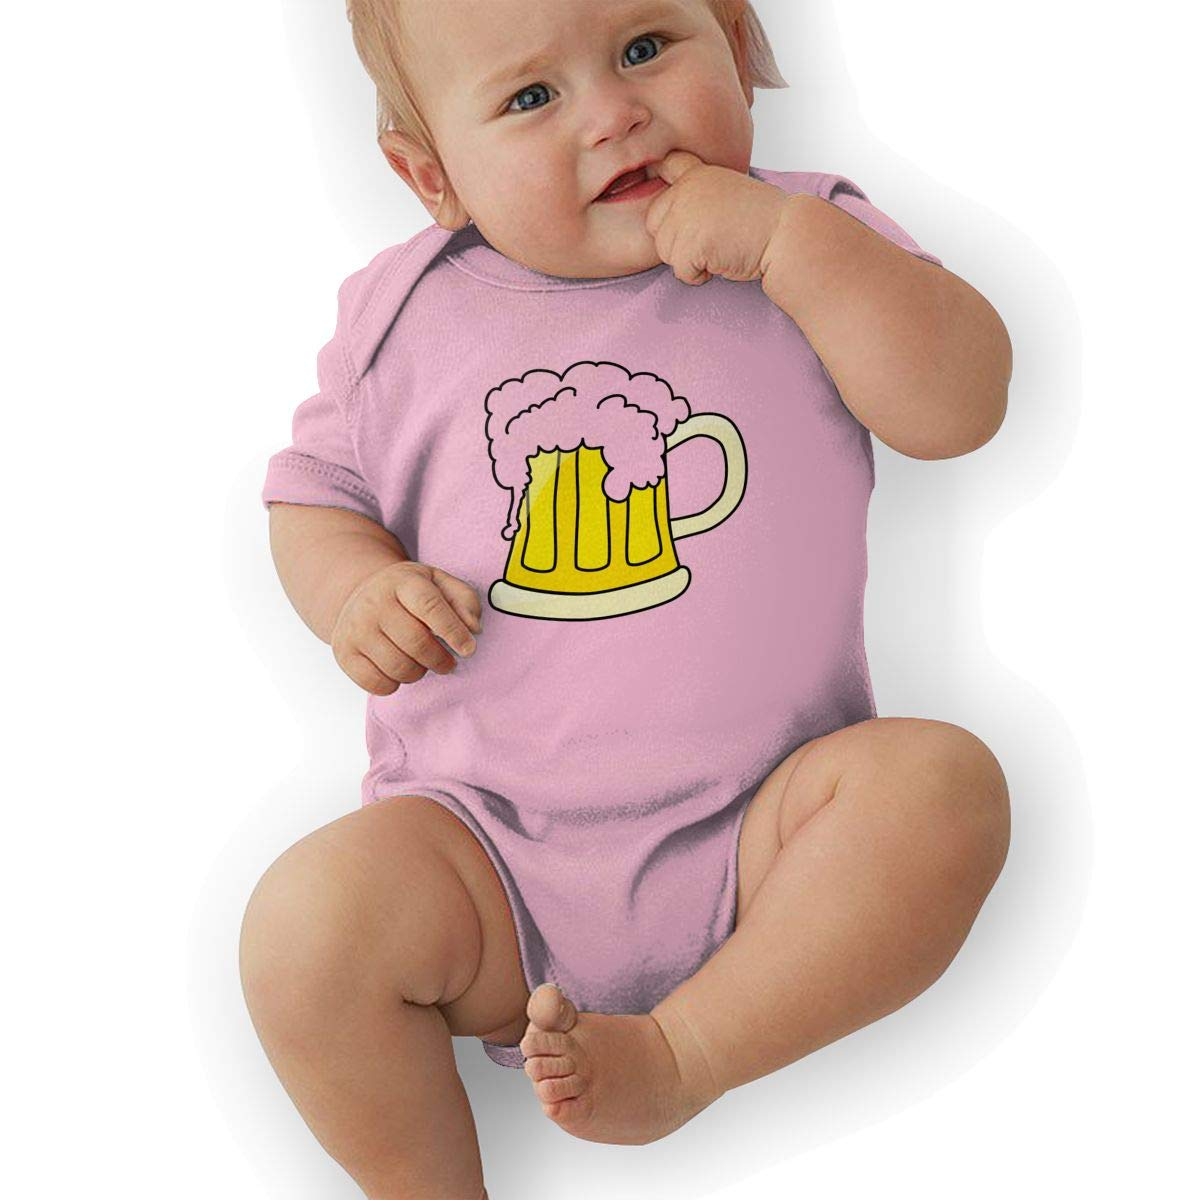 BONLOR Beer Baby Boys Girls Jumpsuit Overall Romper Bodysuit Summer Clothes Pink